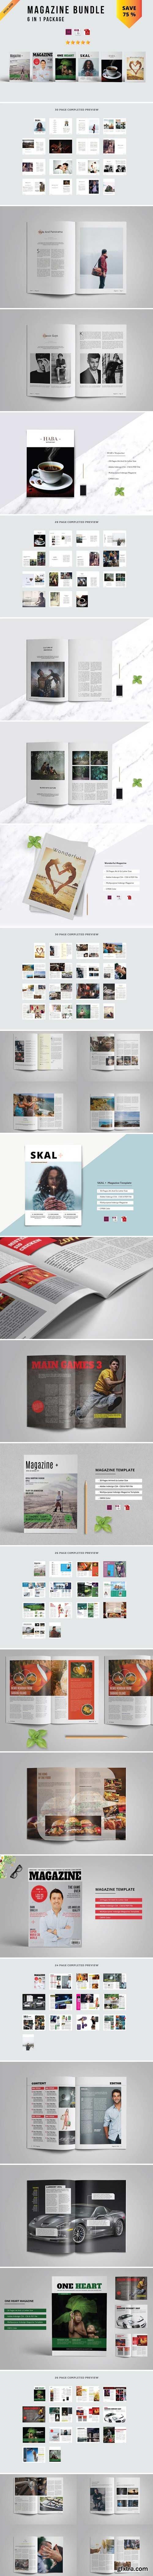 CM - Magazine Bundle 2185033